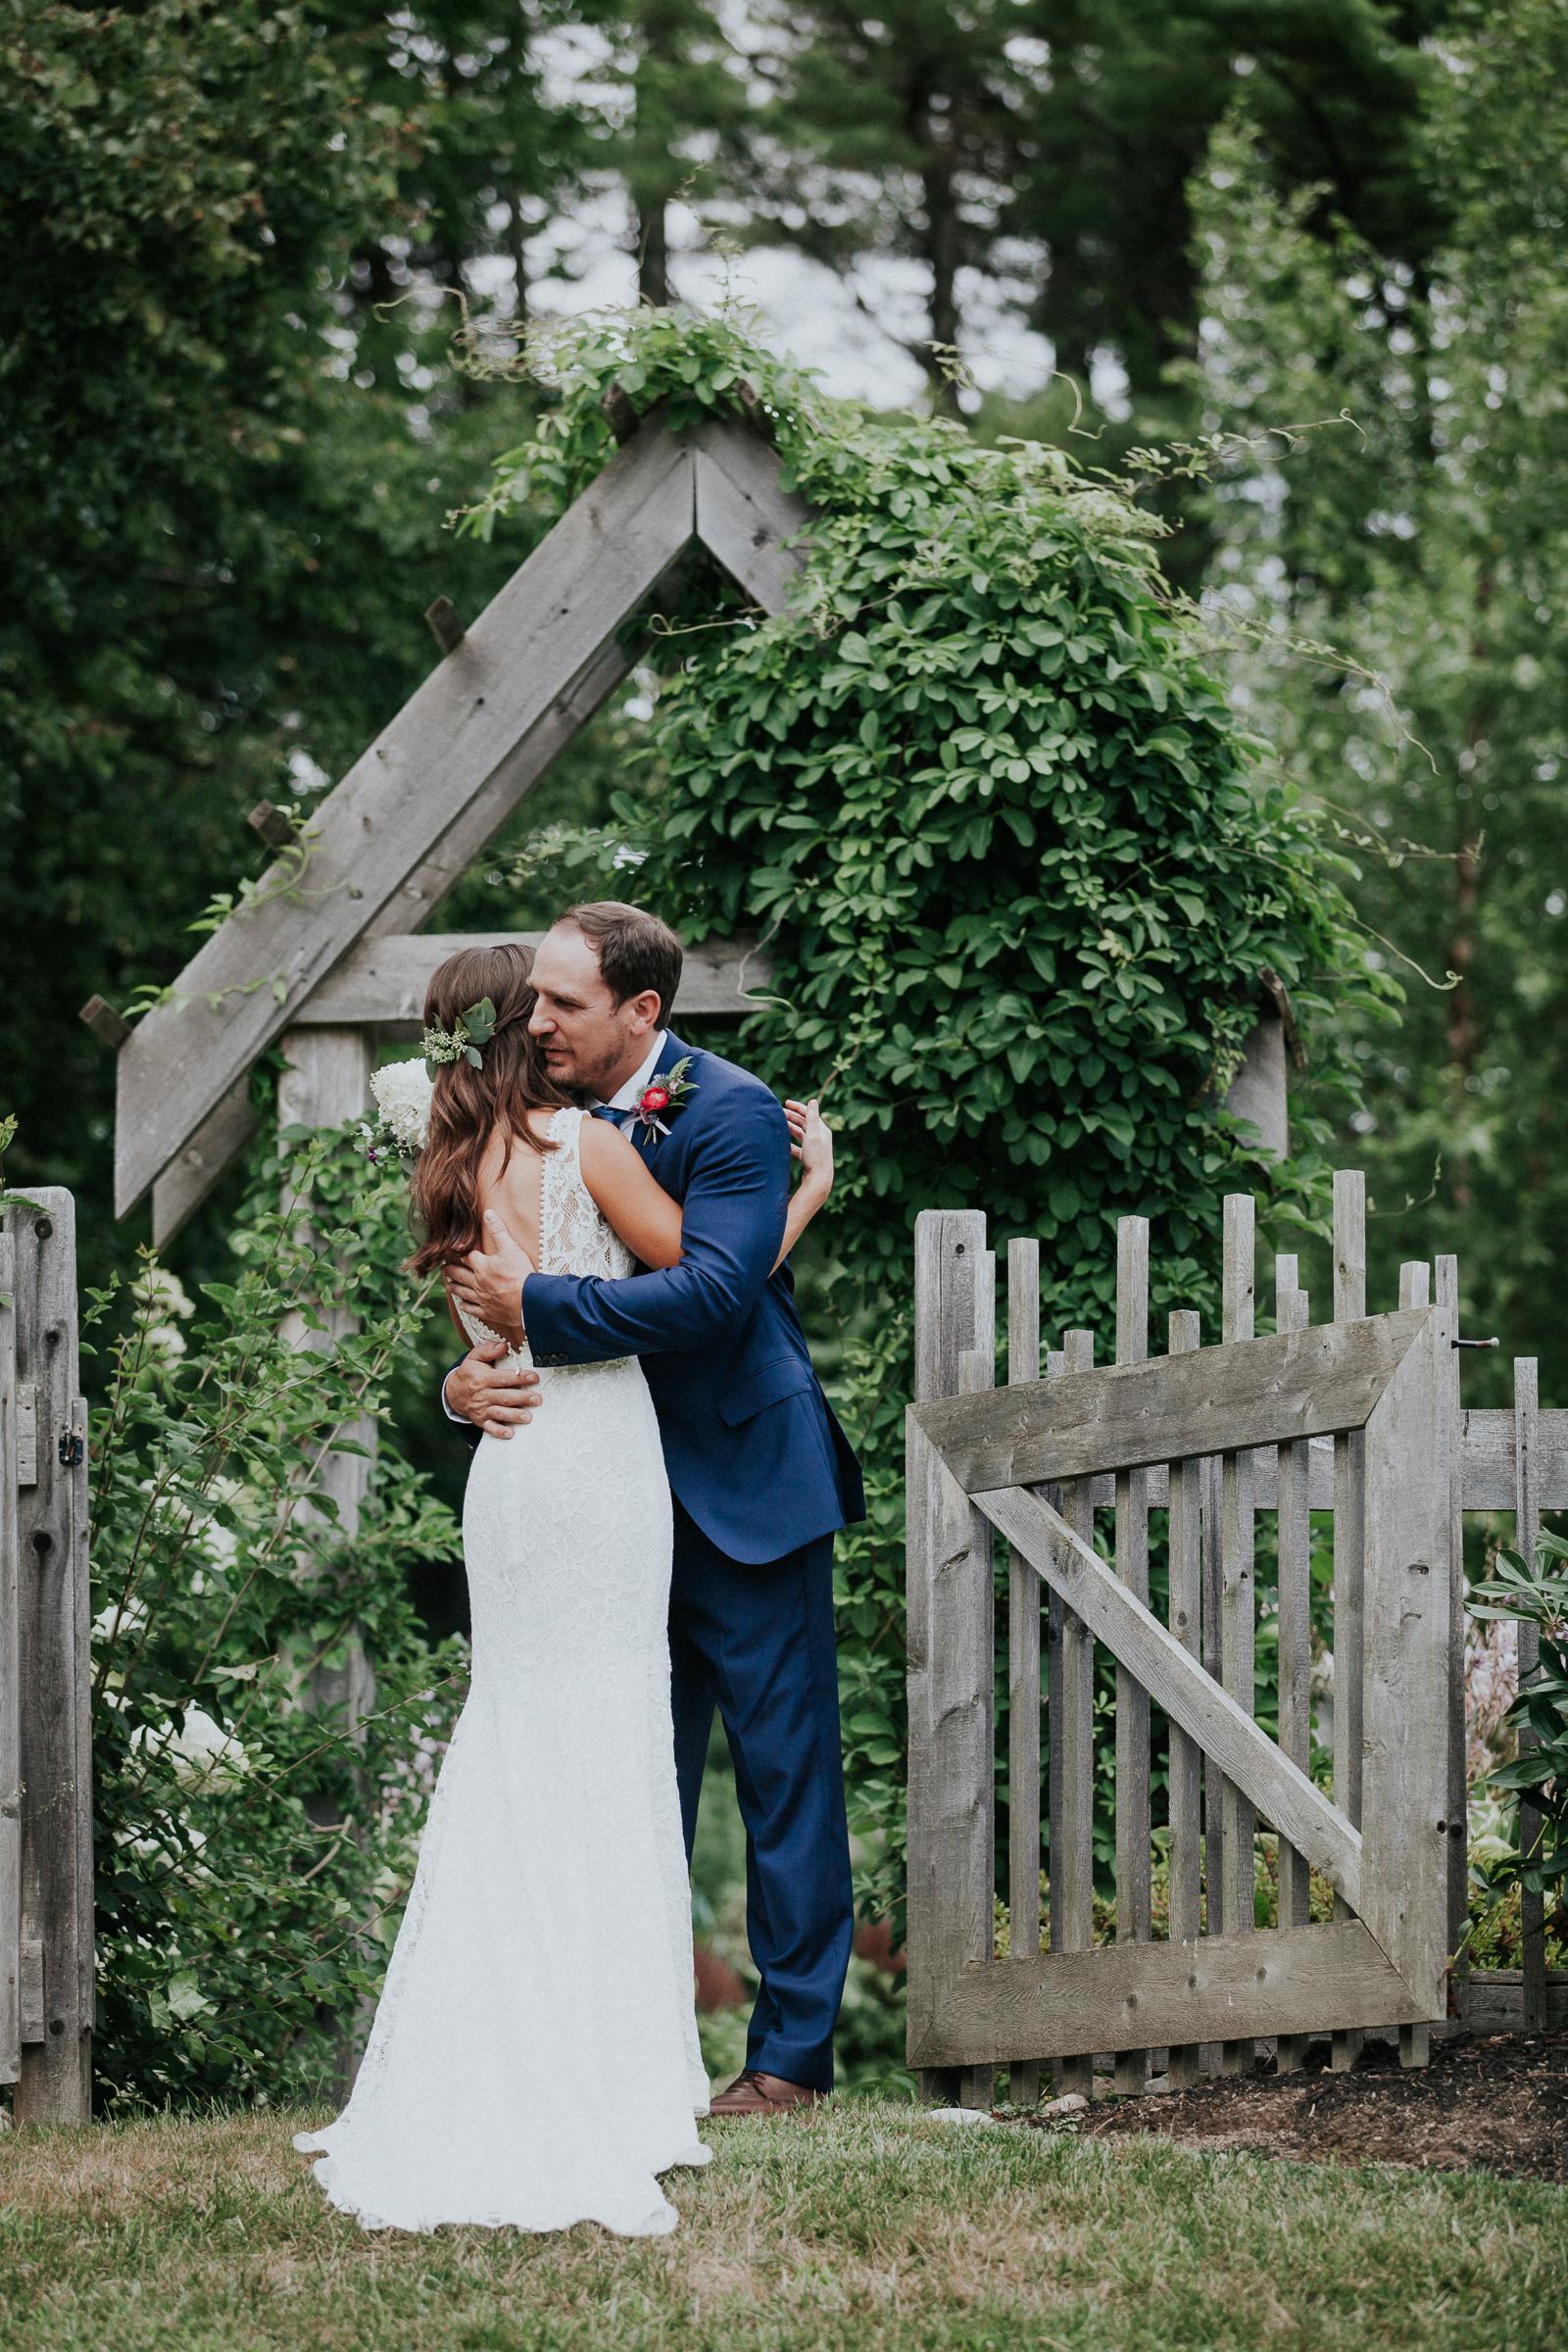 Marianmade-Farm-Wiscasset-Maine-Fine-Art-Documentary-Wedding-Photographer-Elvira-Kalviste-Photography-33.jpg